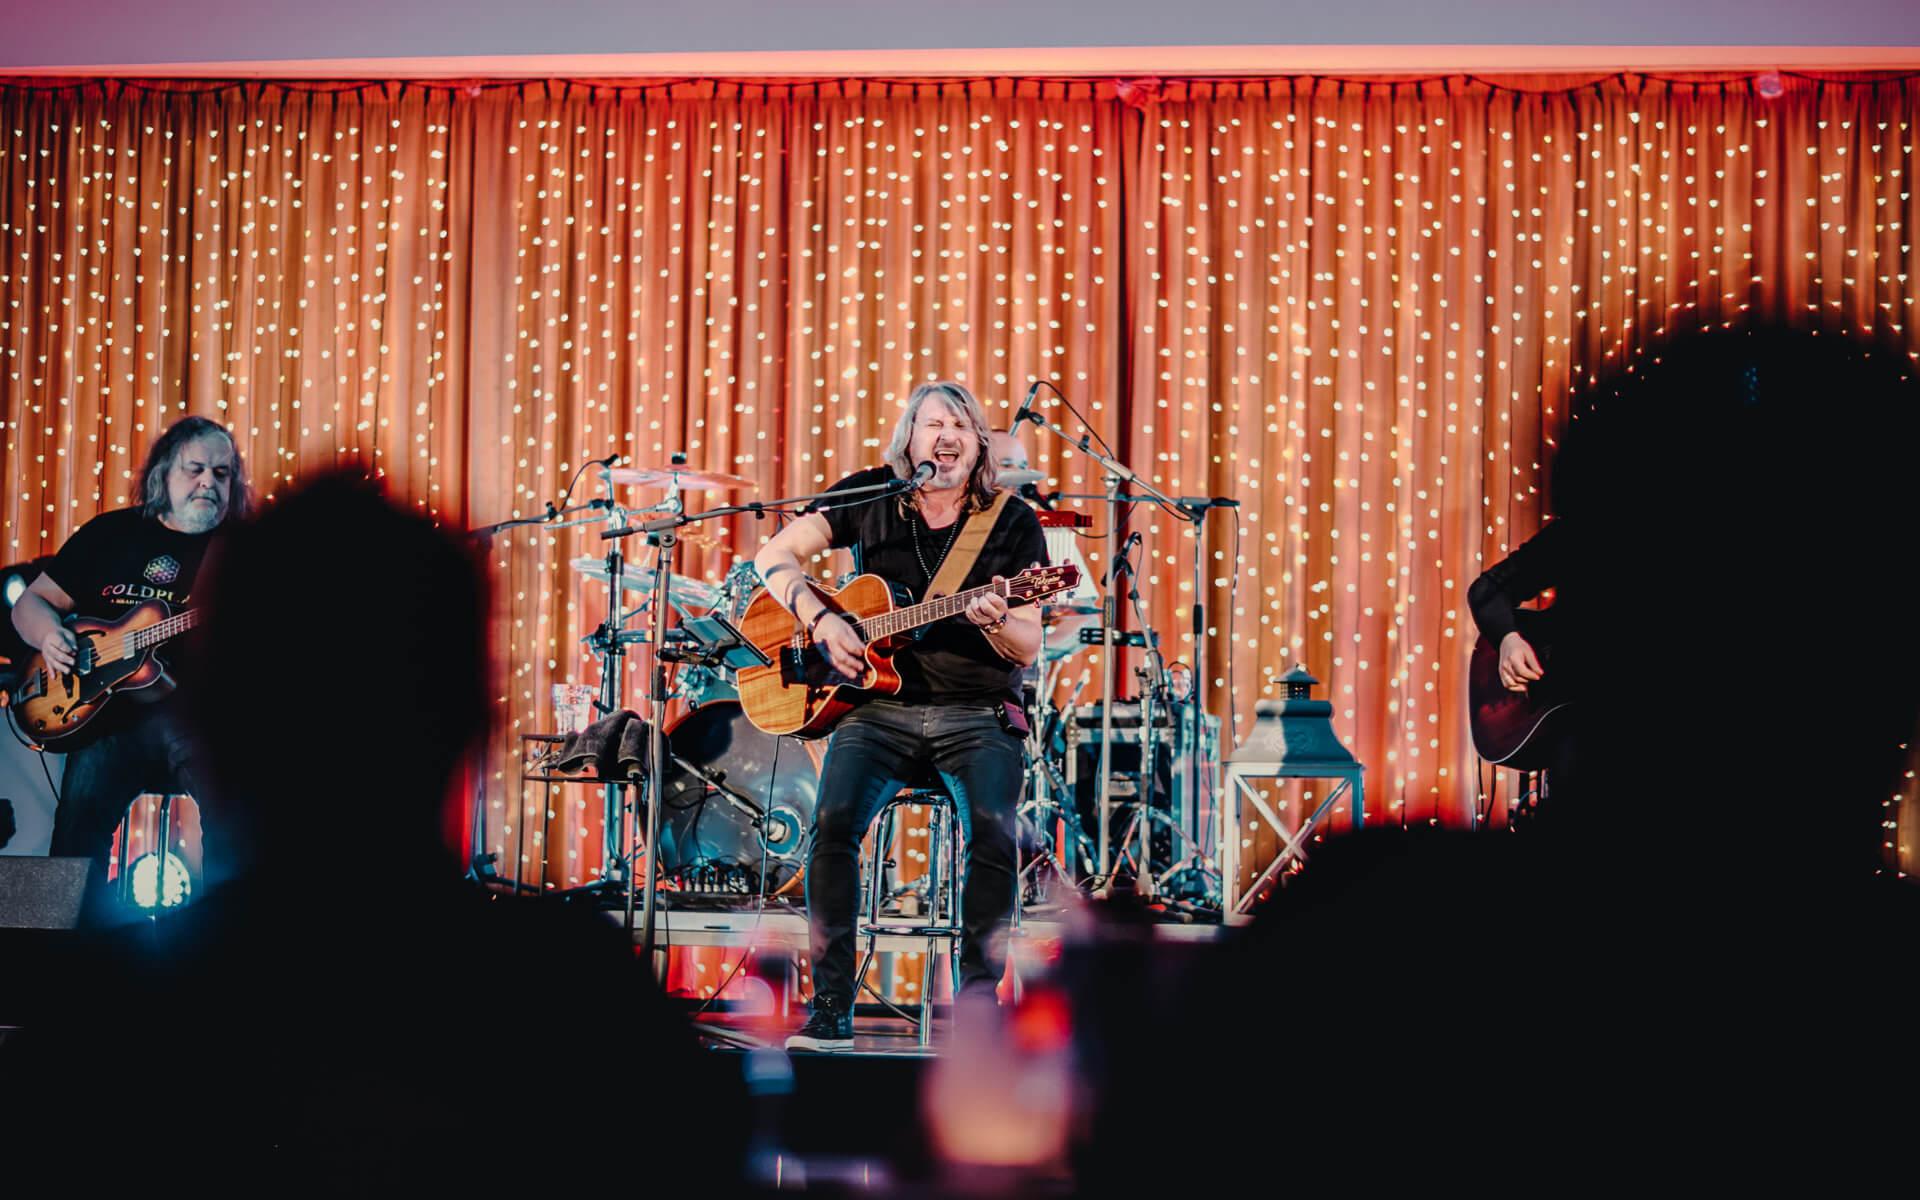 Event, podujatie v resorte Kaskady - hudobný koncert